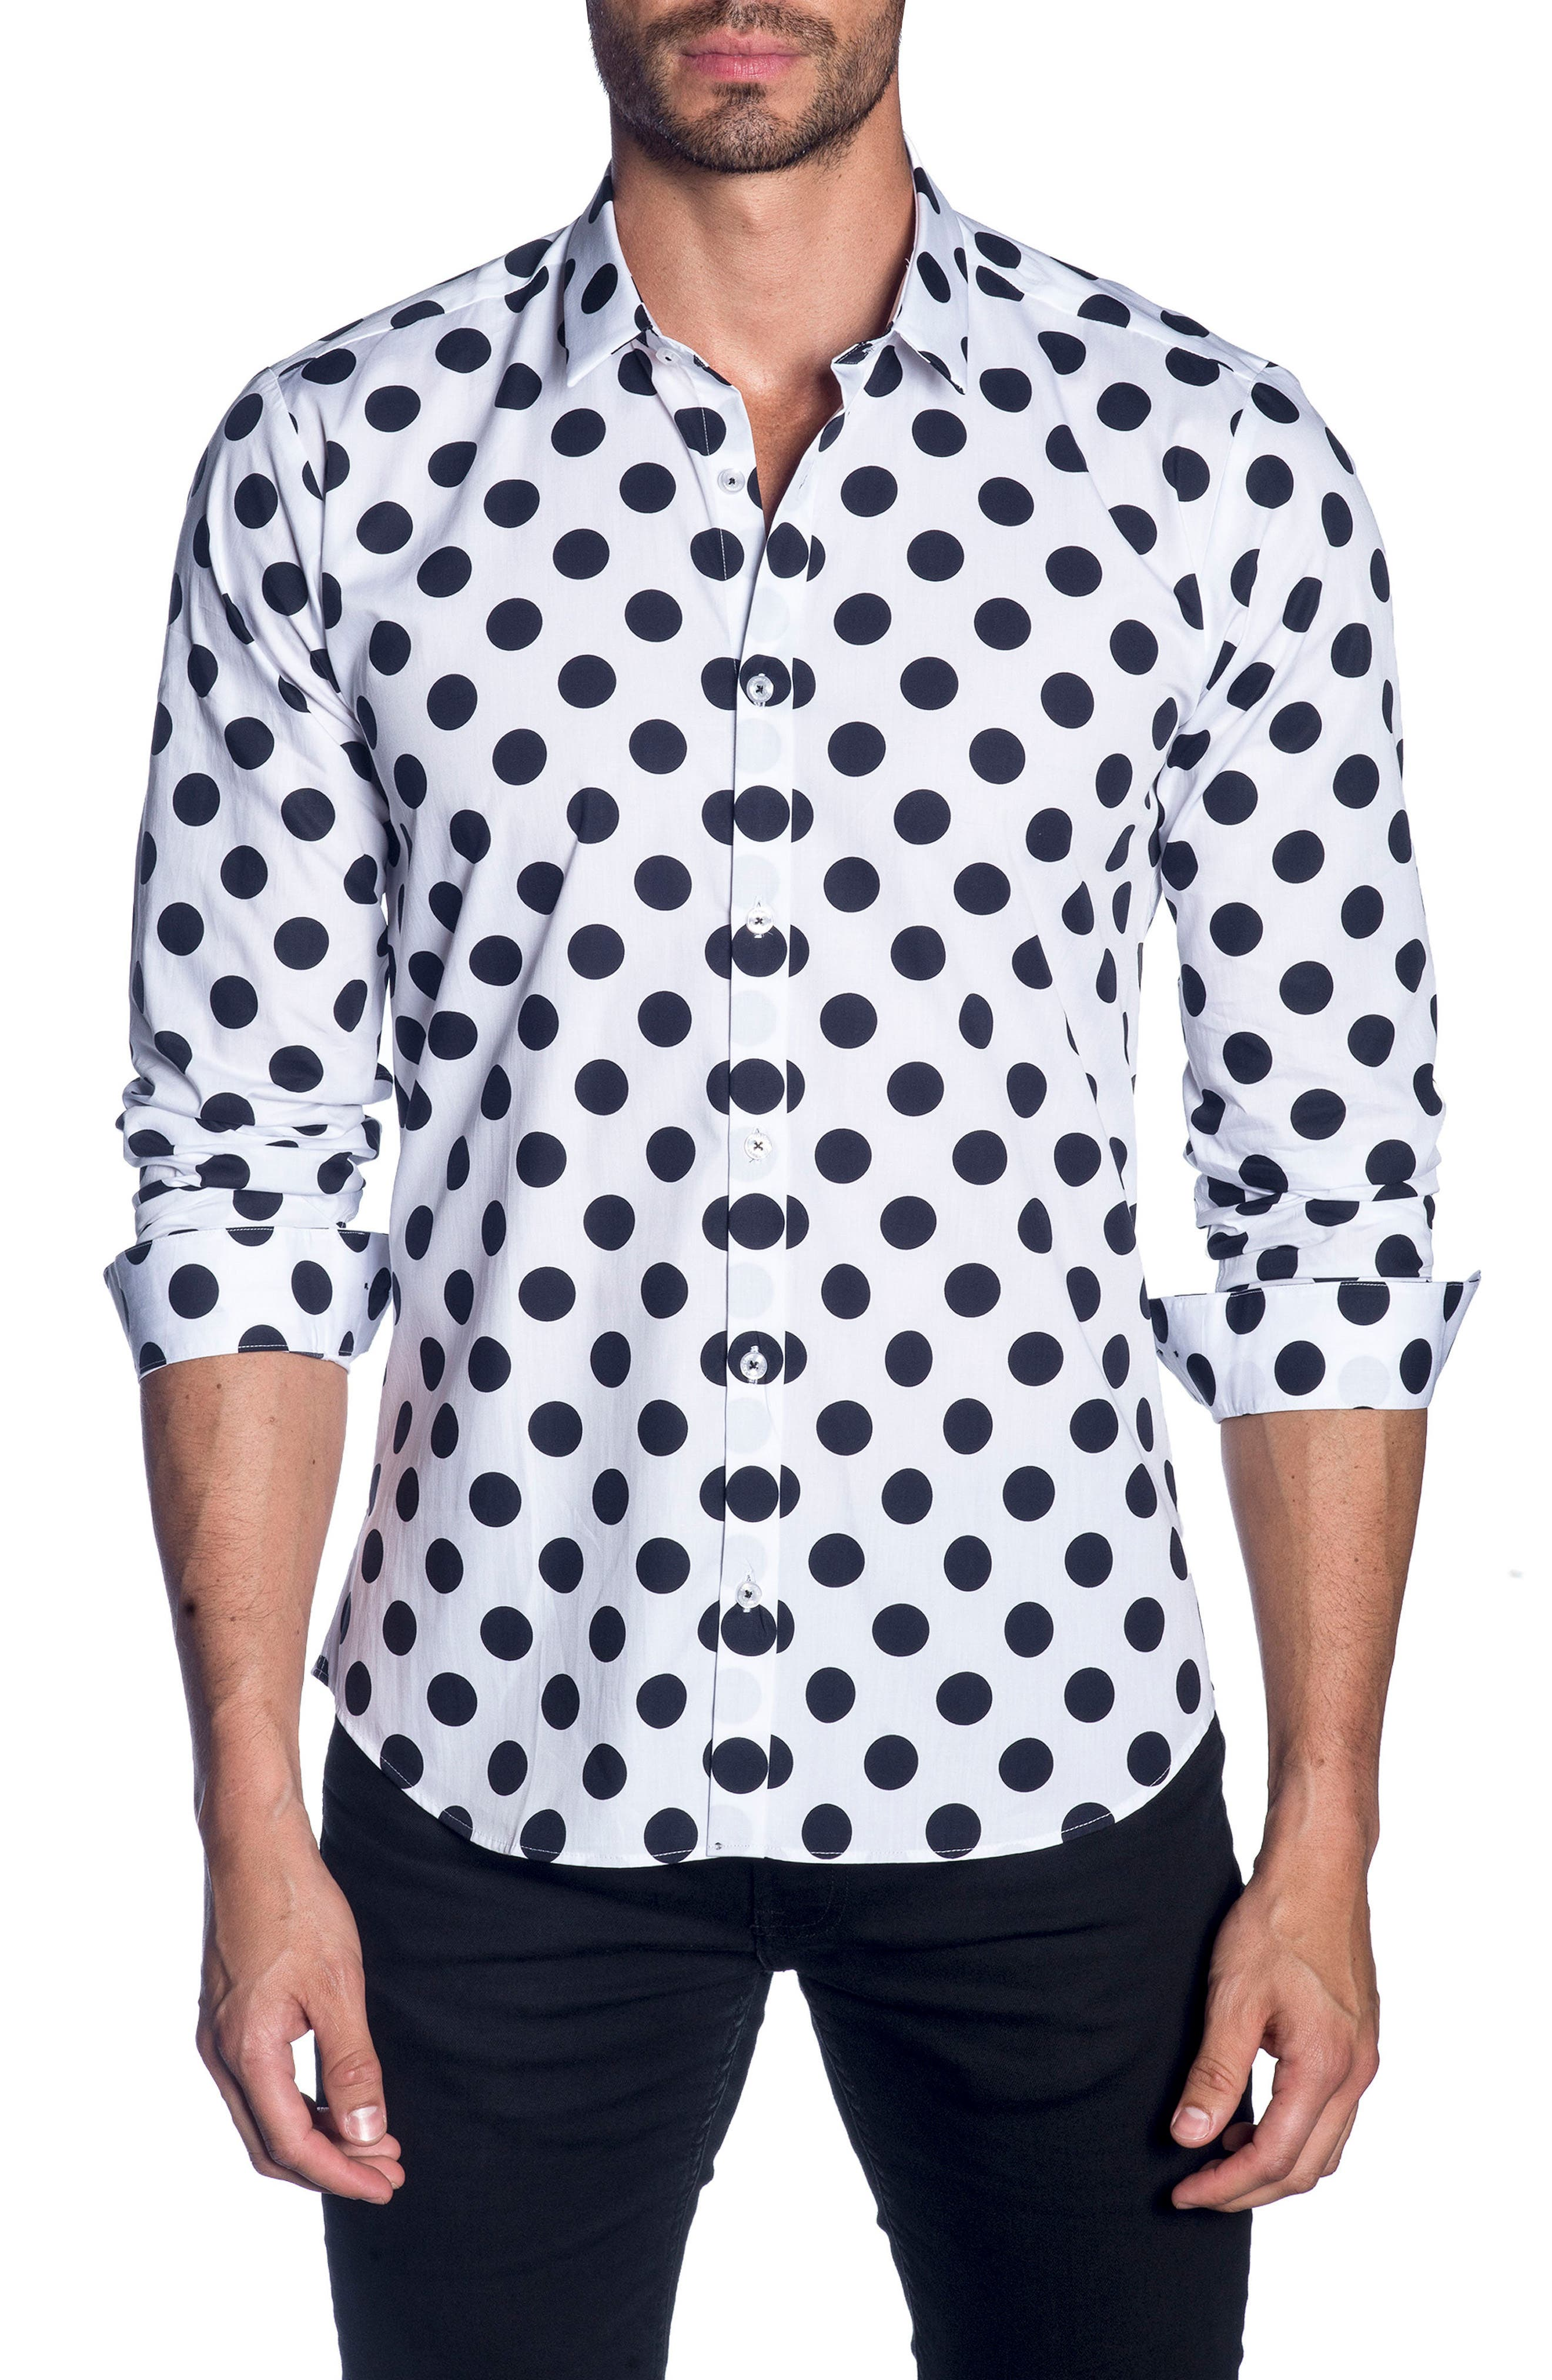 Trim Fit Sport Shirt,                             Main thumbnail 1, color,                             WHITE BLACK POLKA DOT